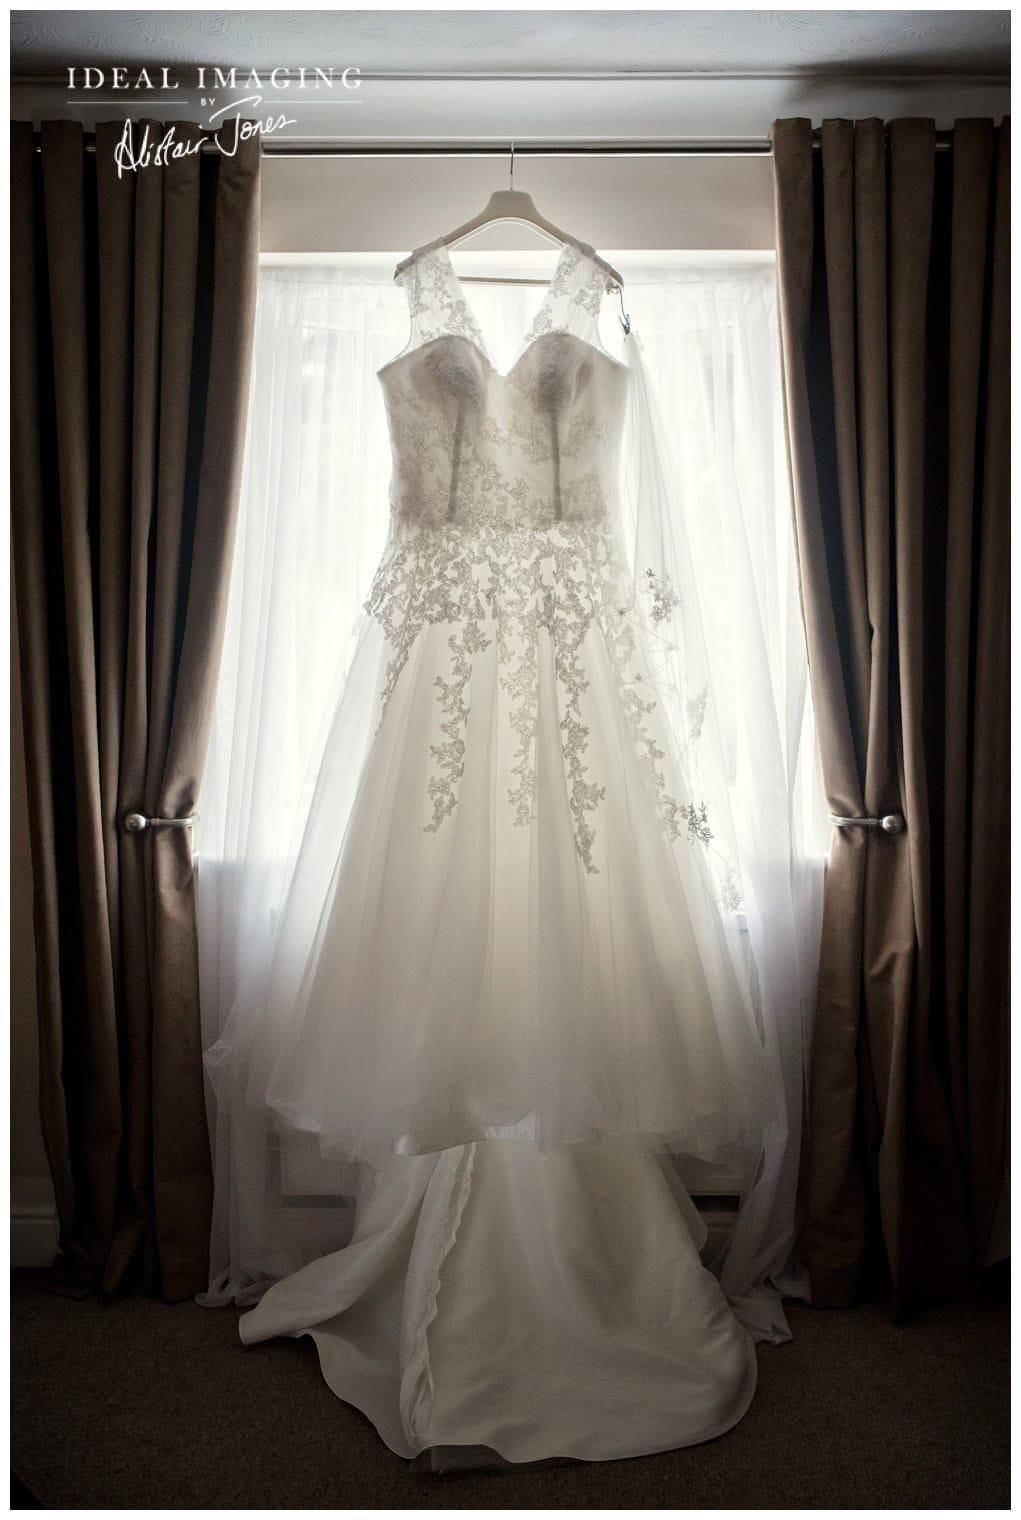 canterbury_cathedral_wedding-015